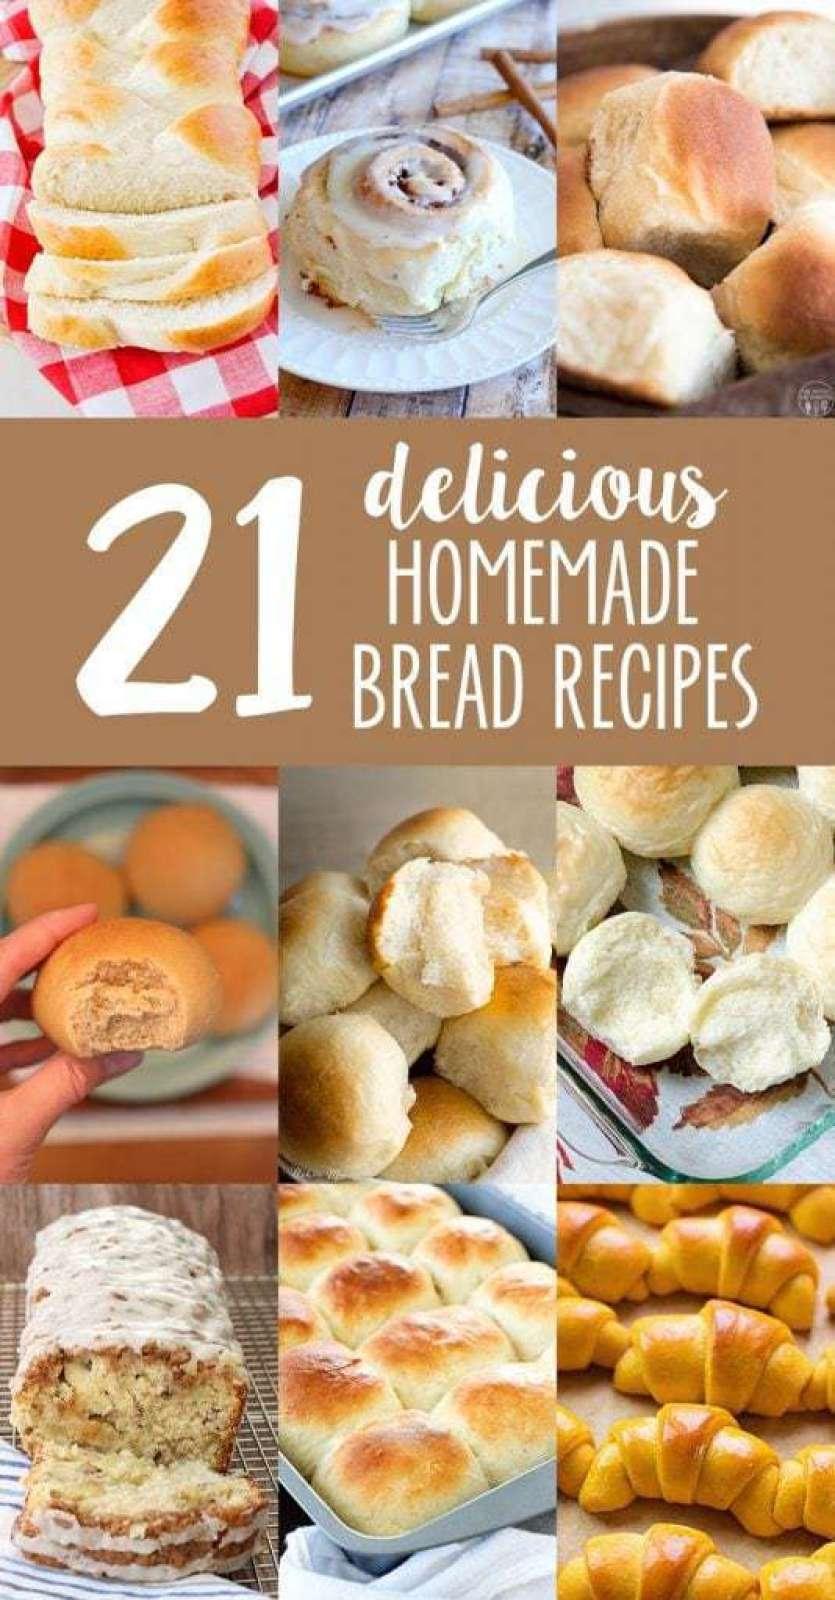 homemade_bread_recipes